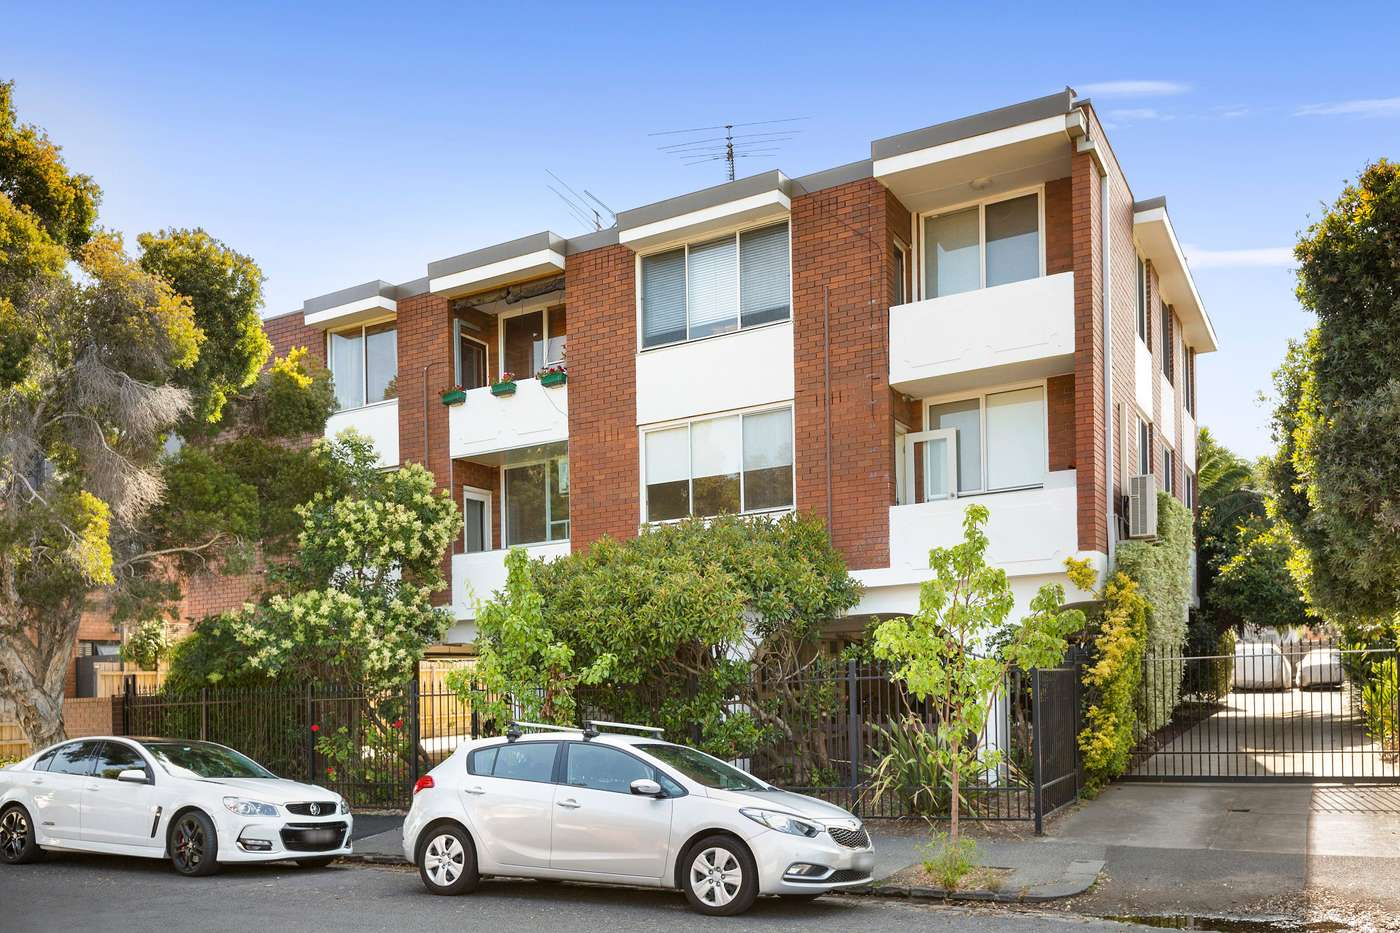 Main view of Homely apartment listing, 10/30 Blenheim Street, Balaclava, VIC 3183